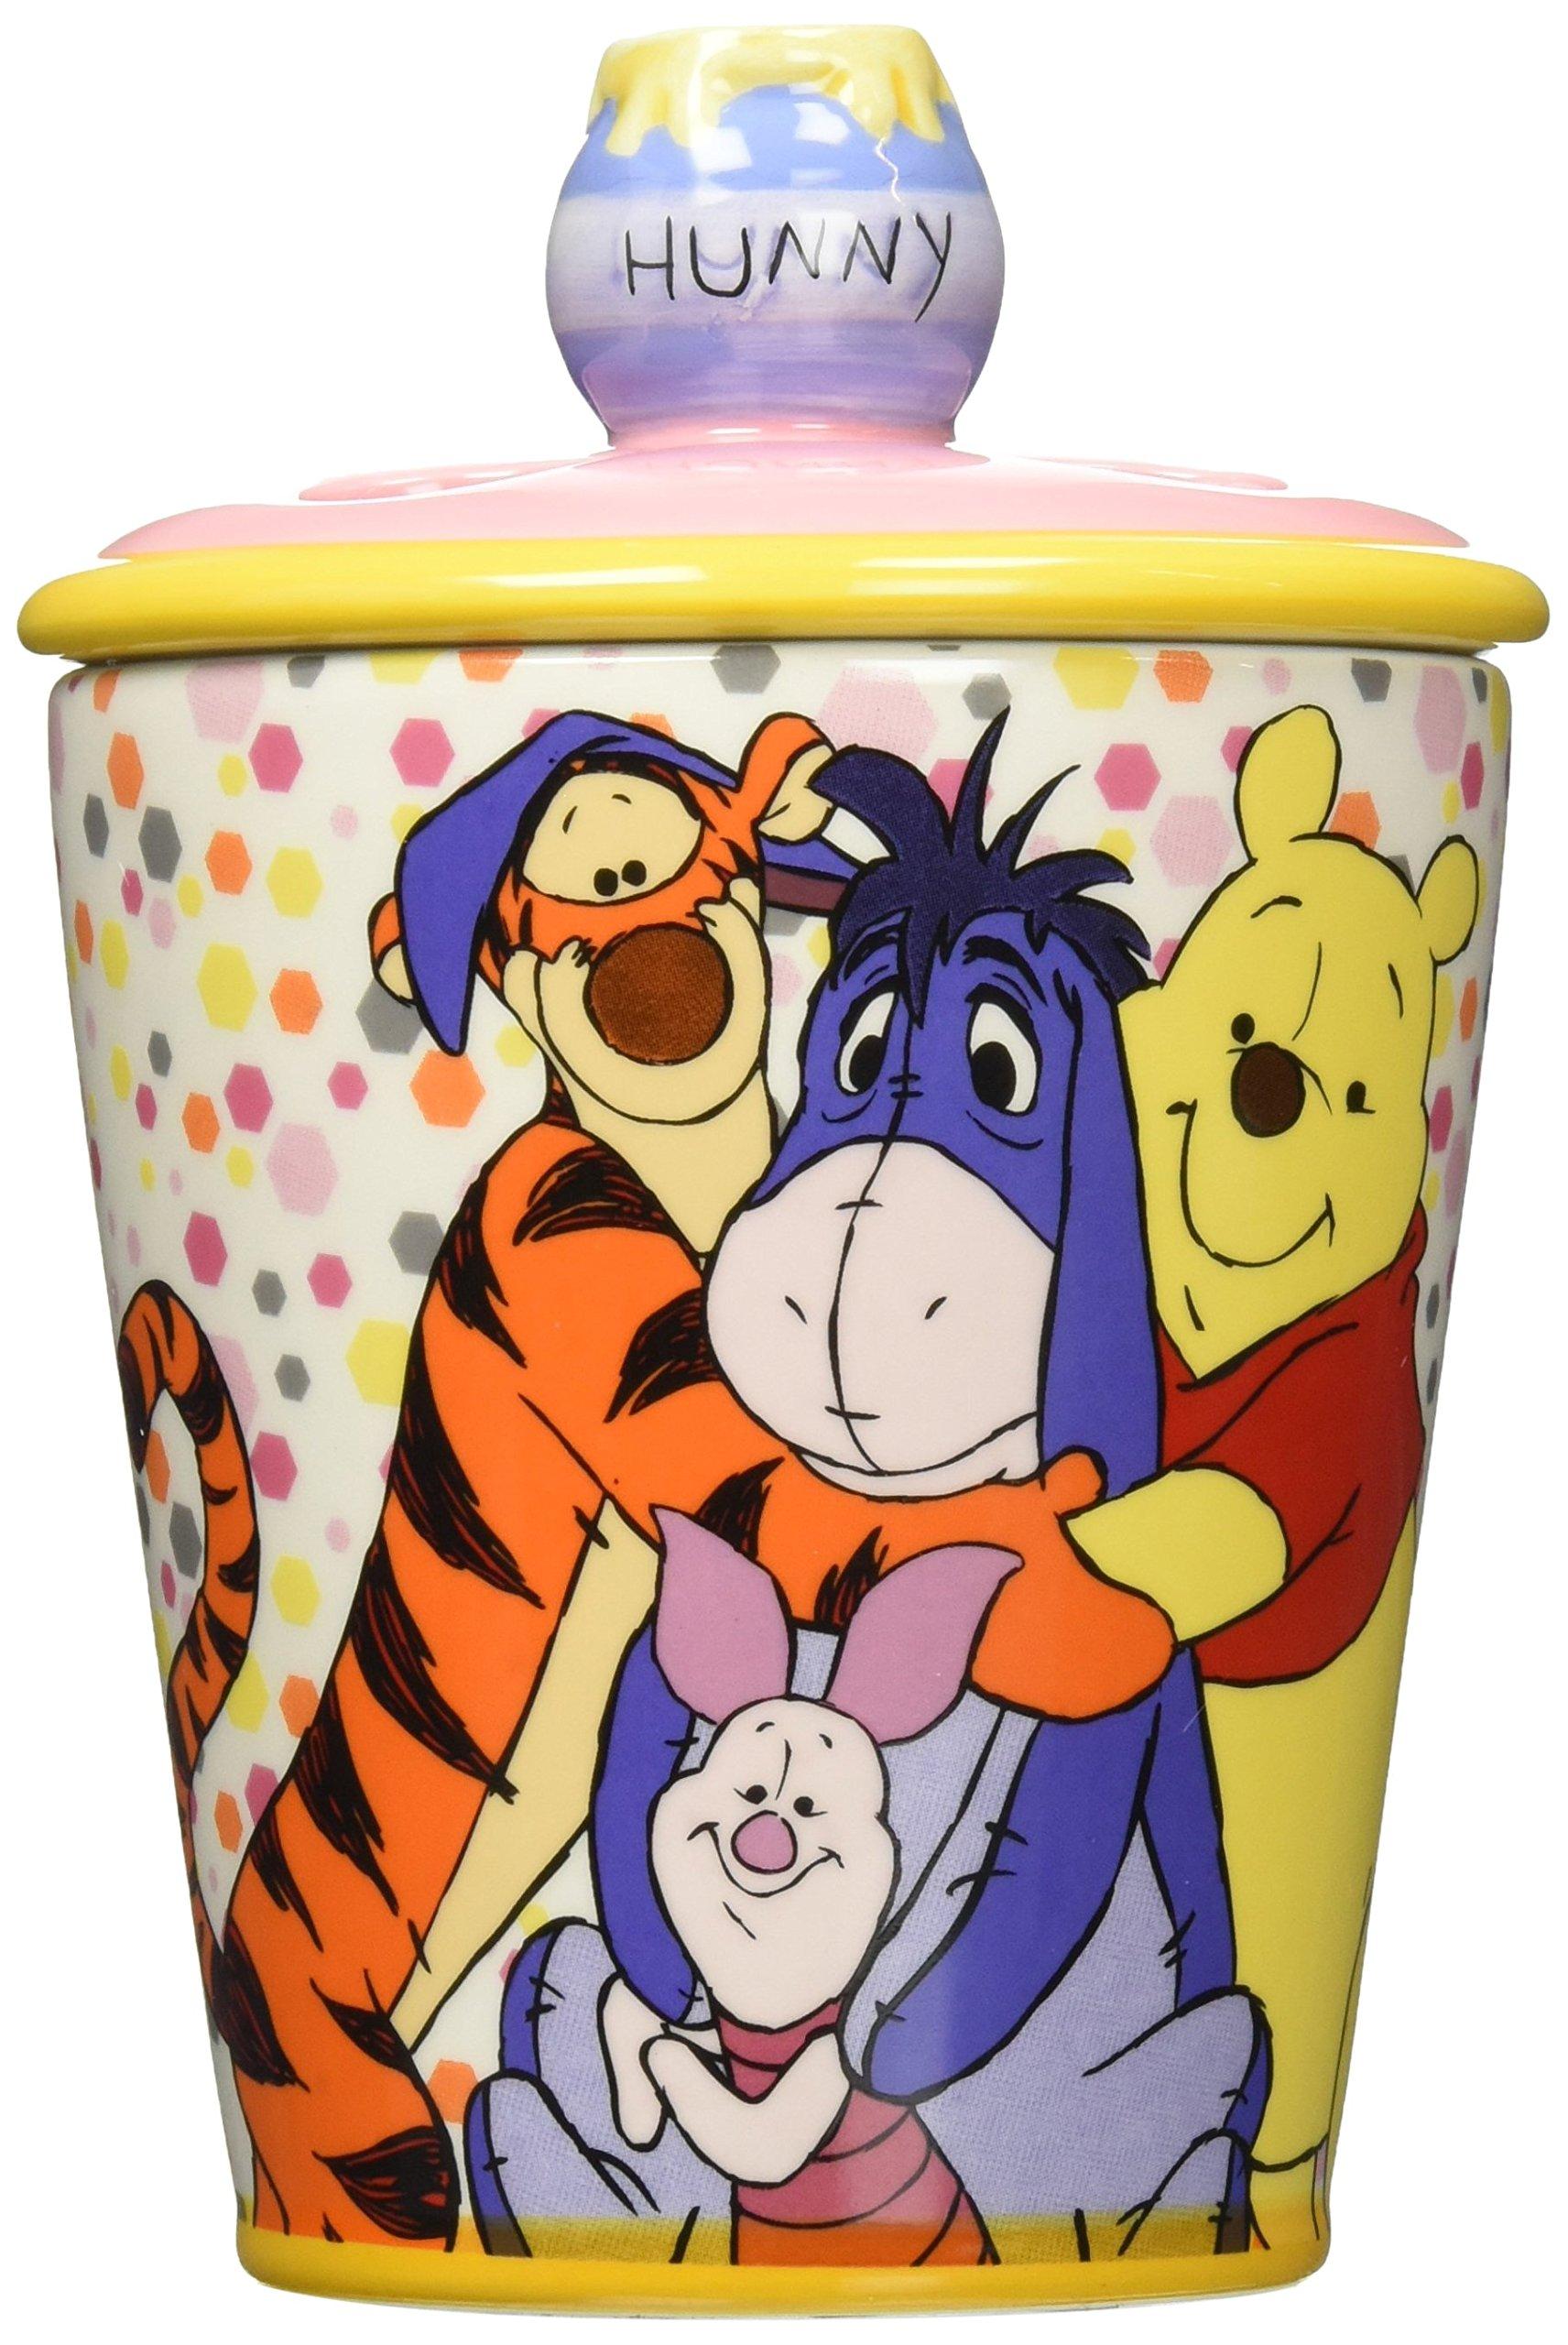 Westland Giftware Ceramic Toothbrush Holder, Disney Winnie The Pooh Best Friends by Westland Giftware